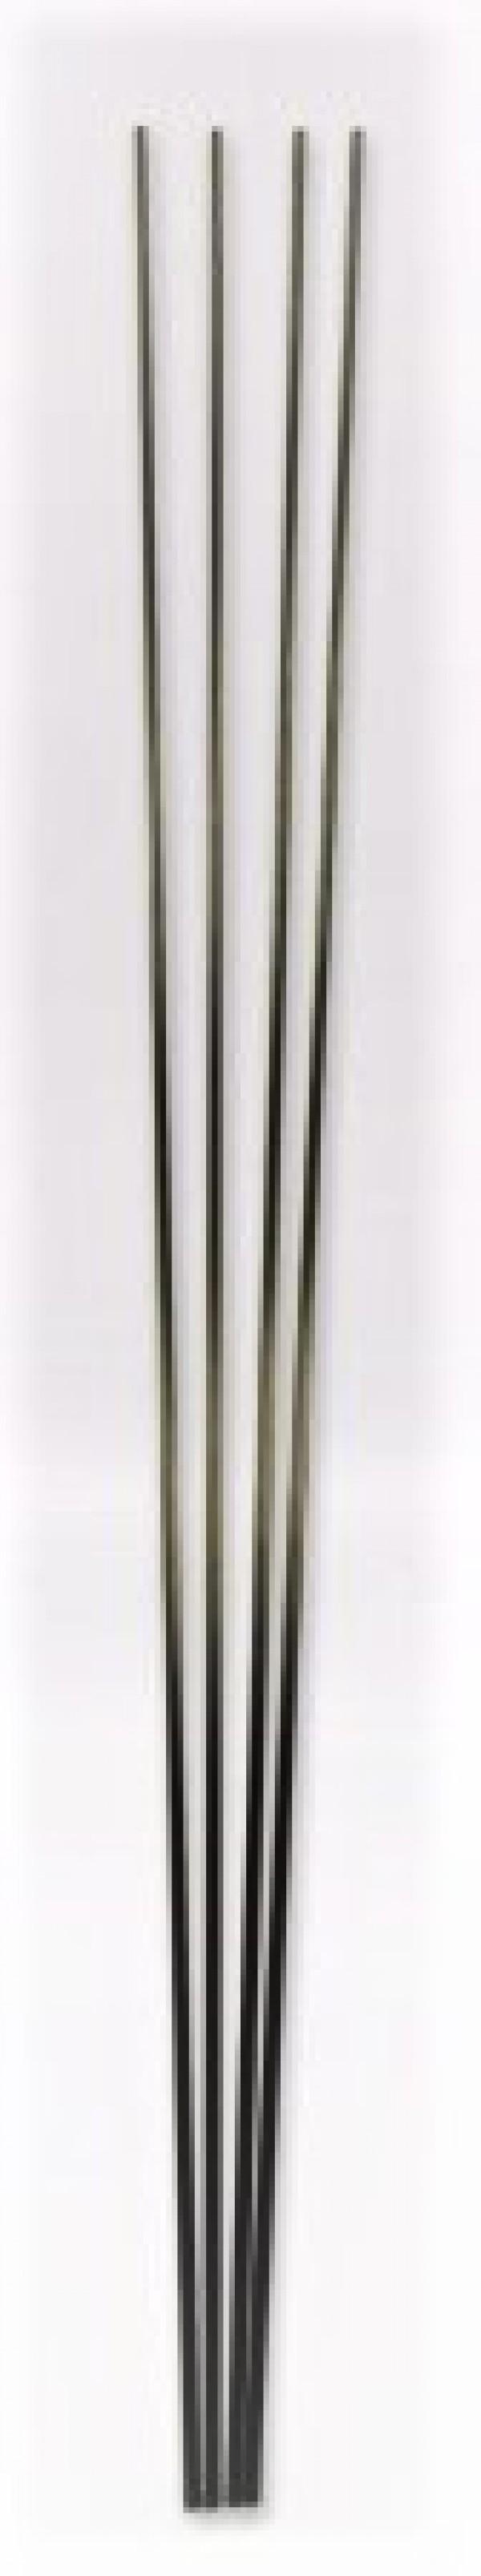 Rezervni deo-Karbon sekcija III deo 10.6mm x 1.1m